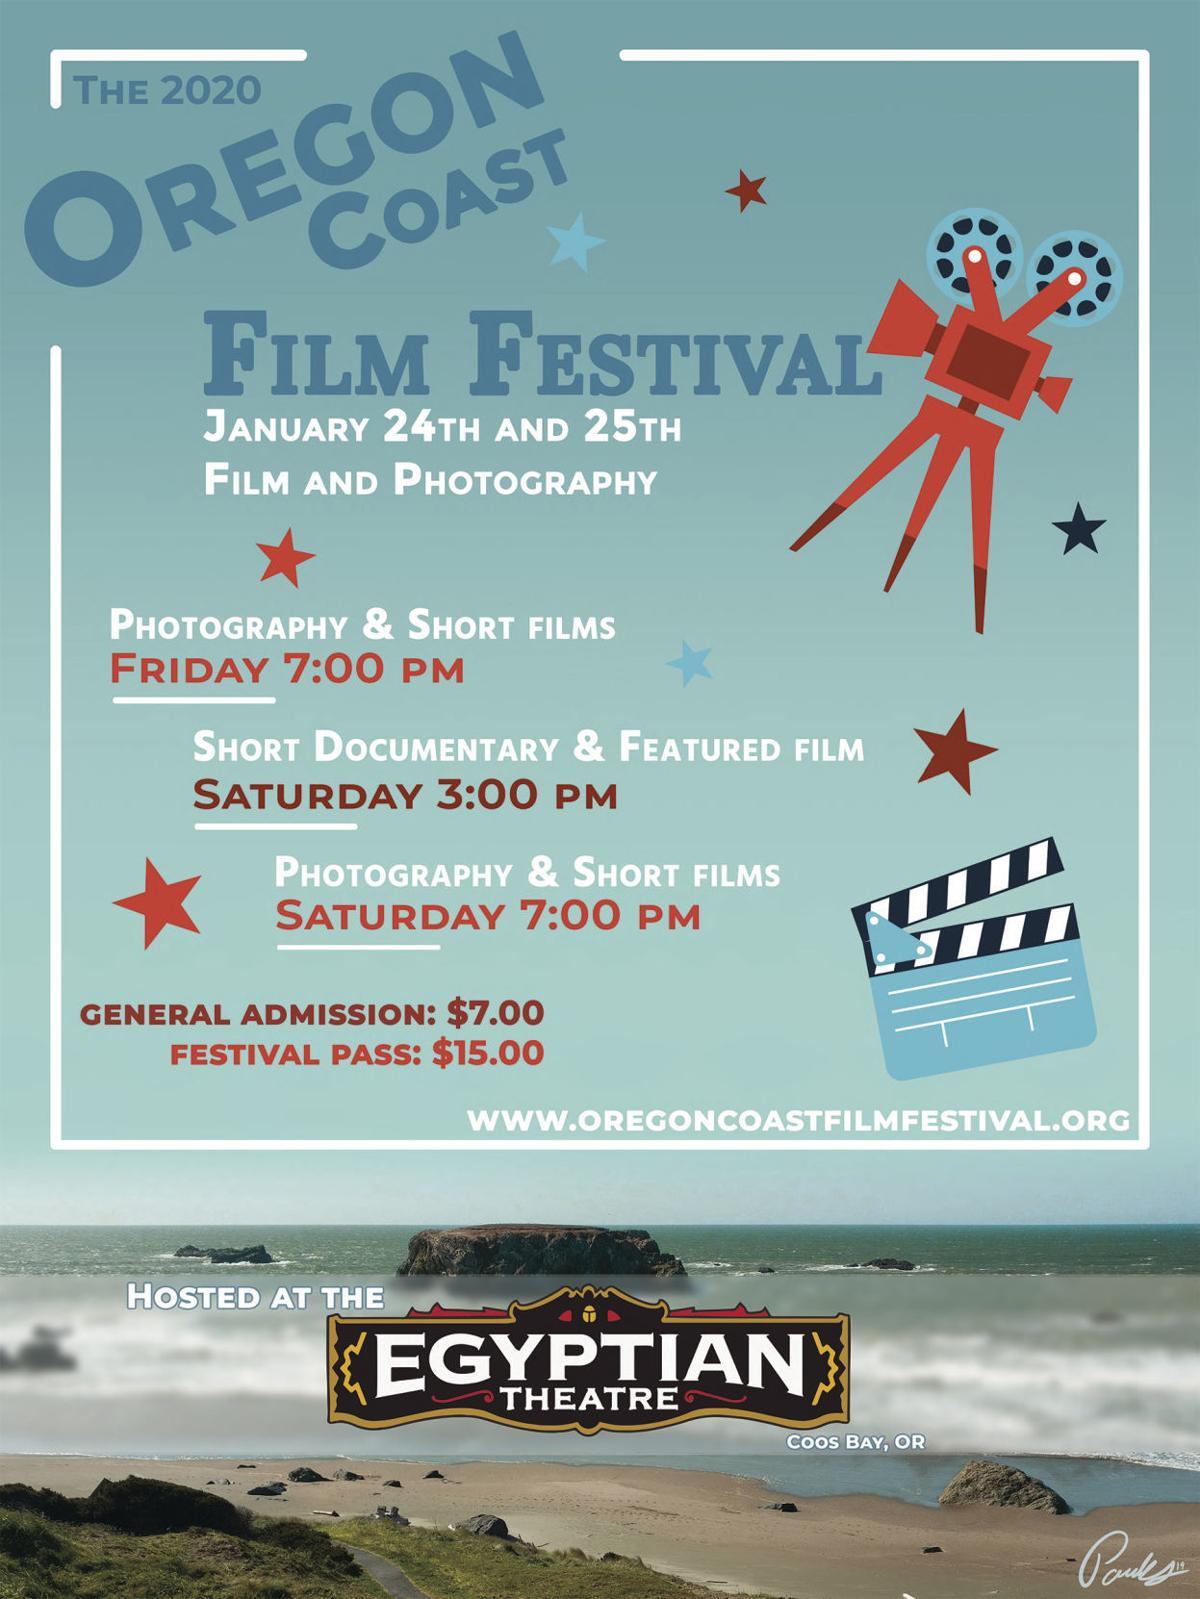 Oregon Coast Film Festival poster by Brandon Parks, 2019 BHS